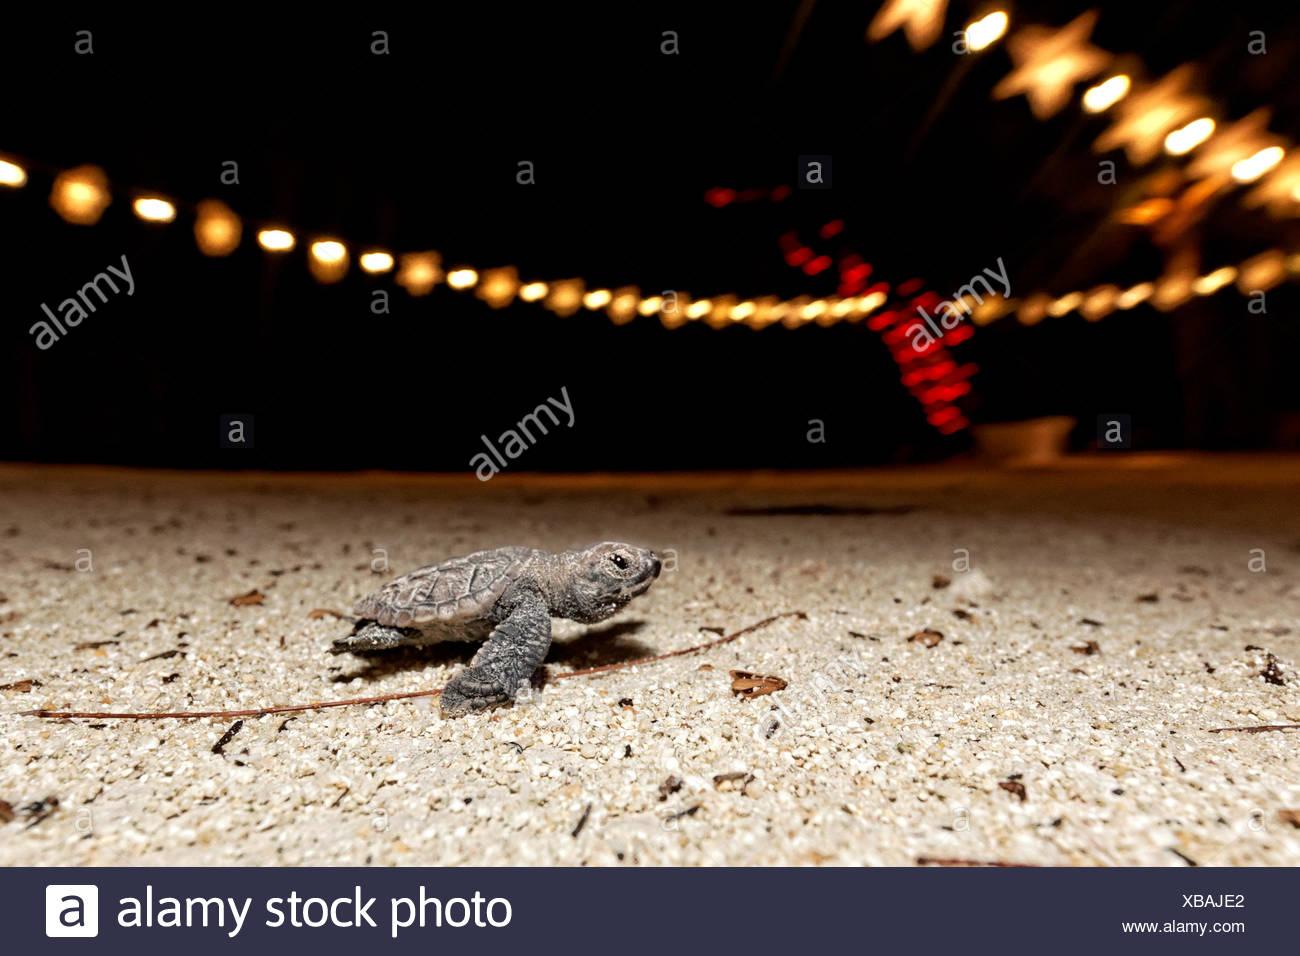 Juvenile Hawksbill Sea Turtle at Beach, Eretmochelys imbricata, Caribbean Sea, Barbados - Stock Image